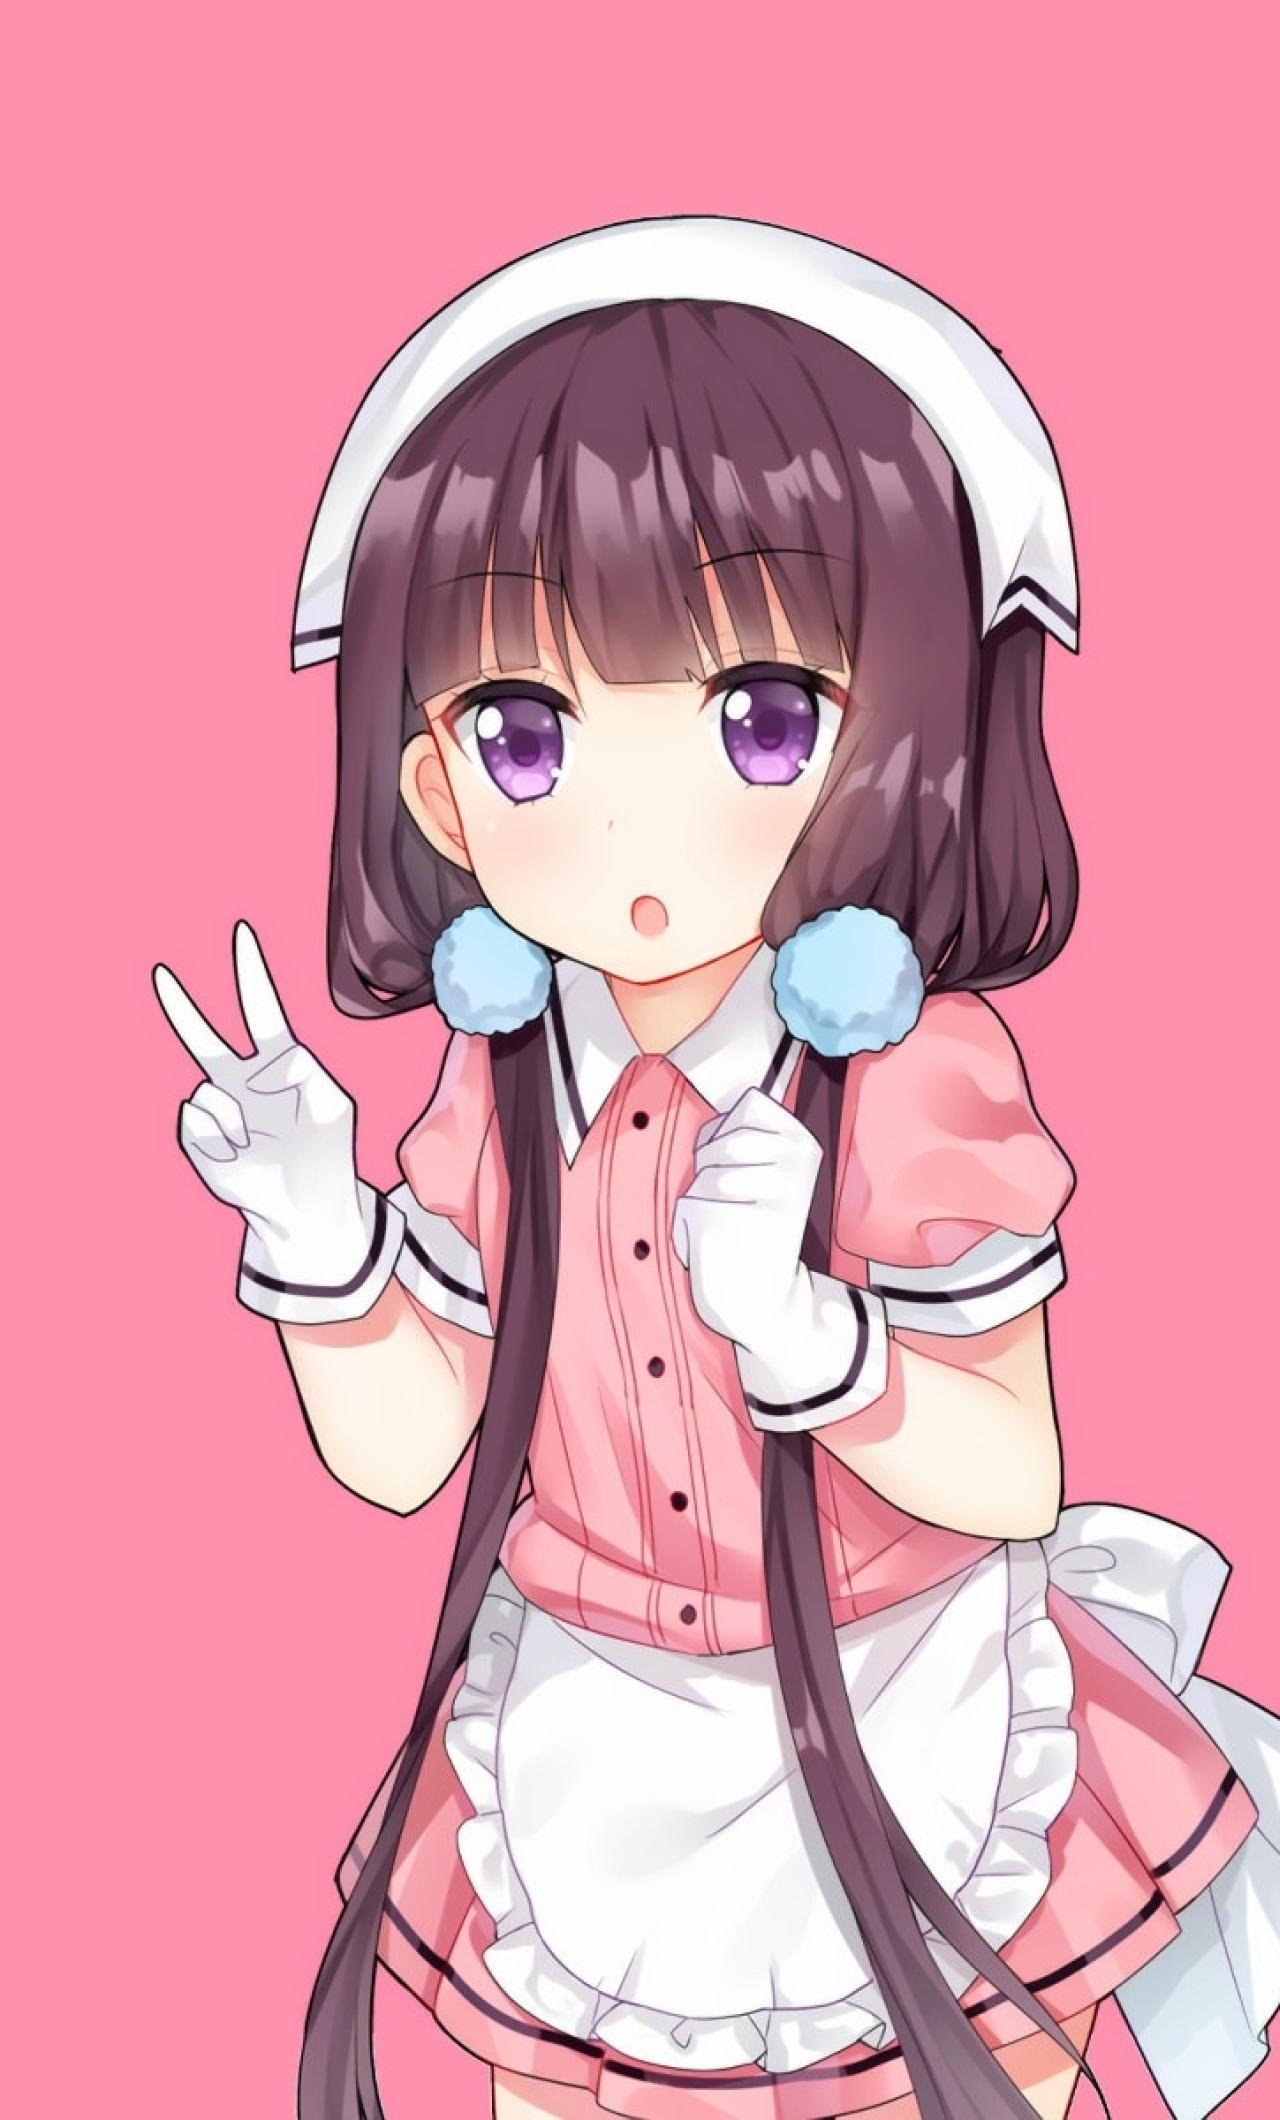 Download Blend S Anime 2560x1080 Resolution Full HD Wallpaper